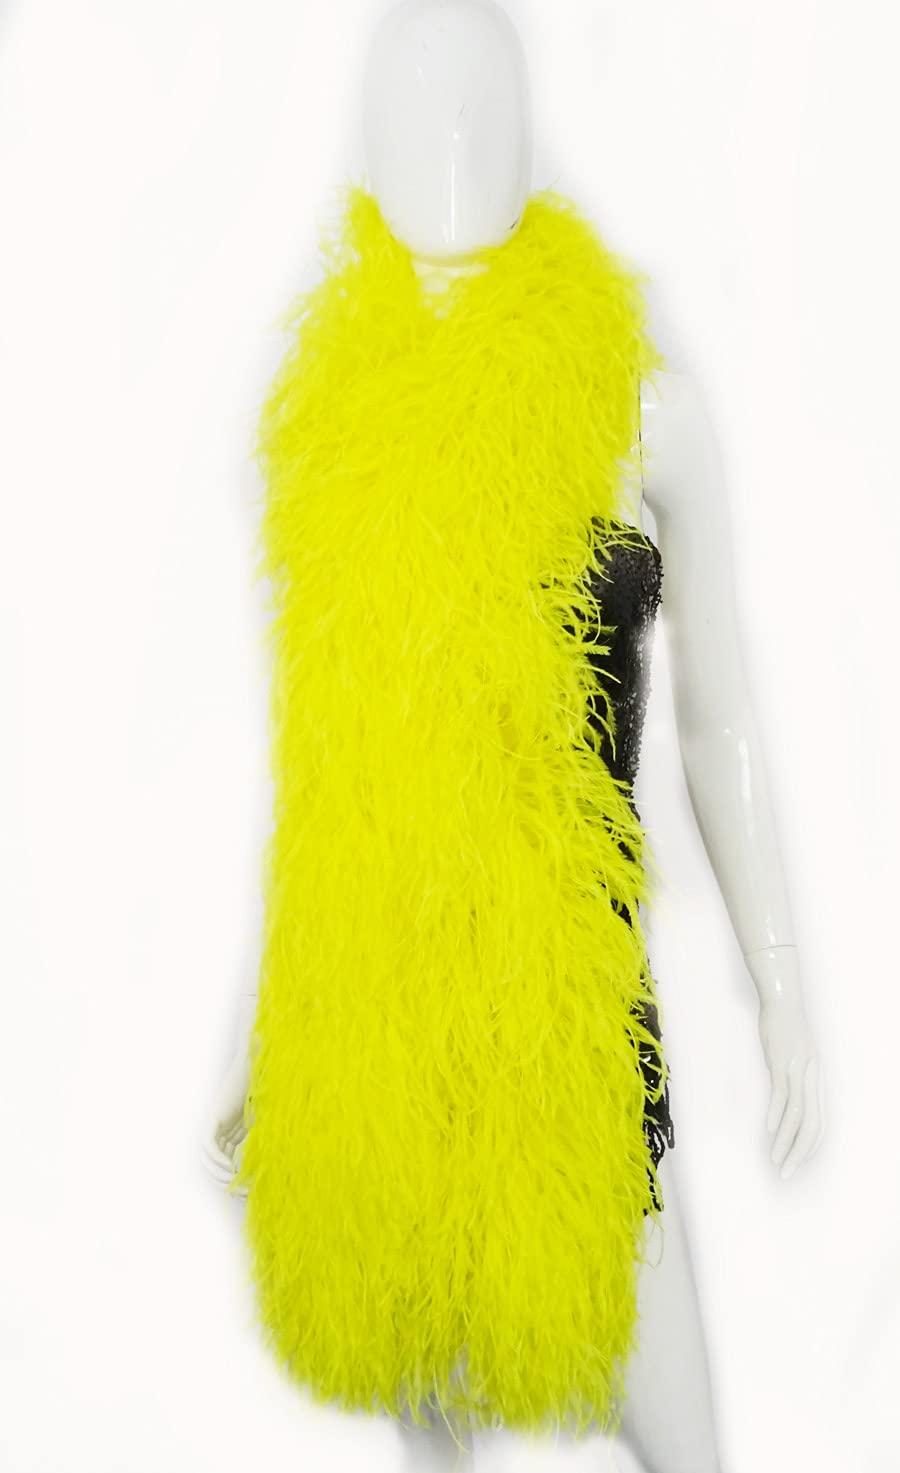 20 Virginia Beach Mall ply yellow Luxury Ostrich 180 Jacksonville Mall cm Feather Boa 71